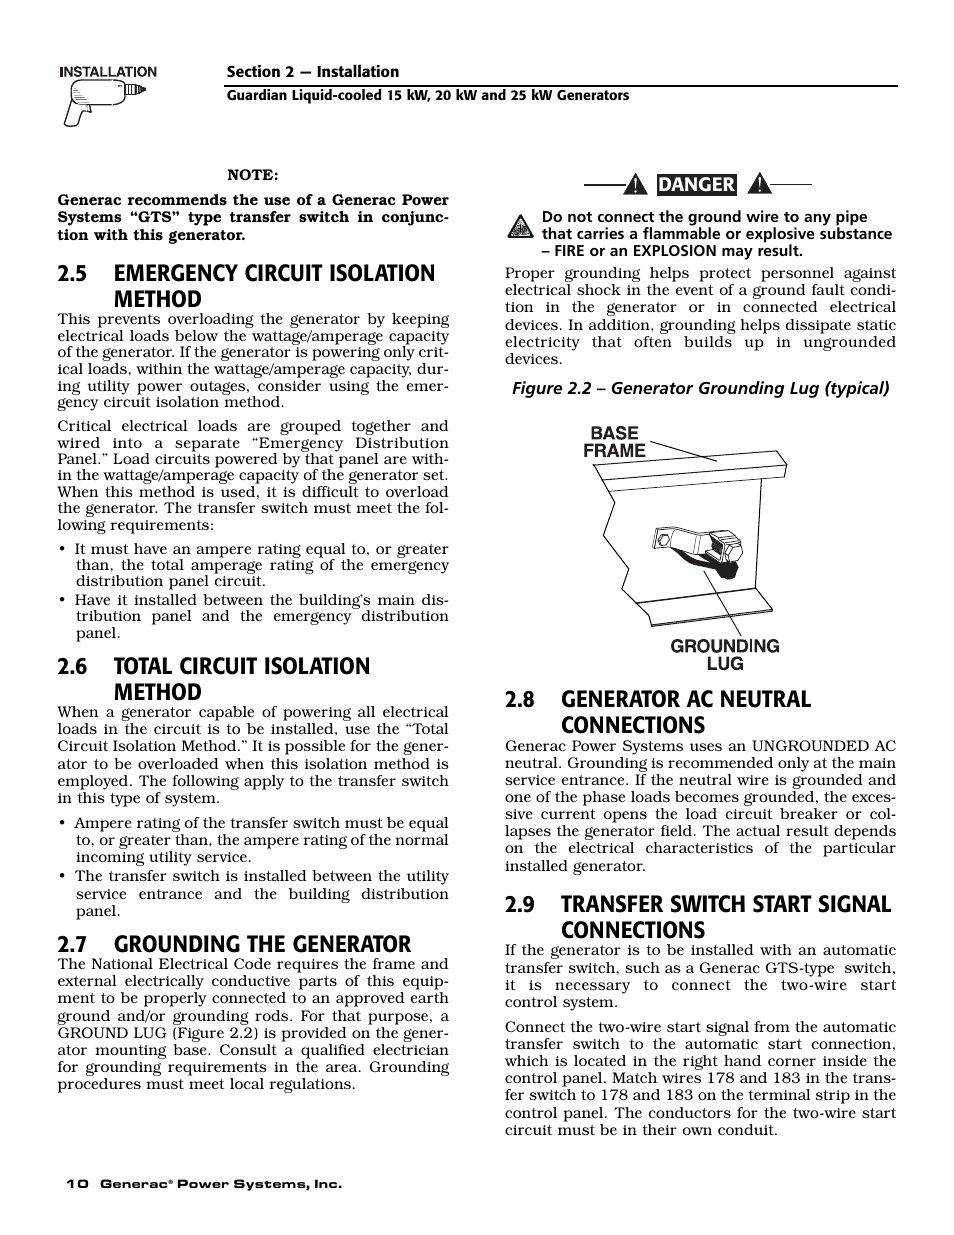 5 emergency circuit isolation method, 6 total circuit isolation ...